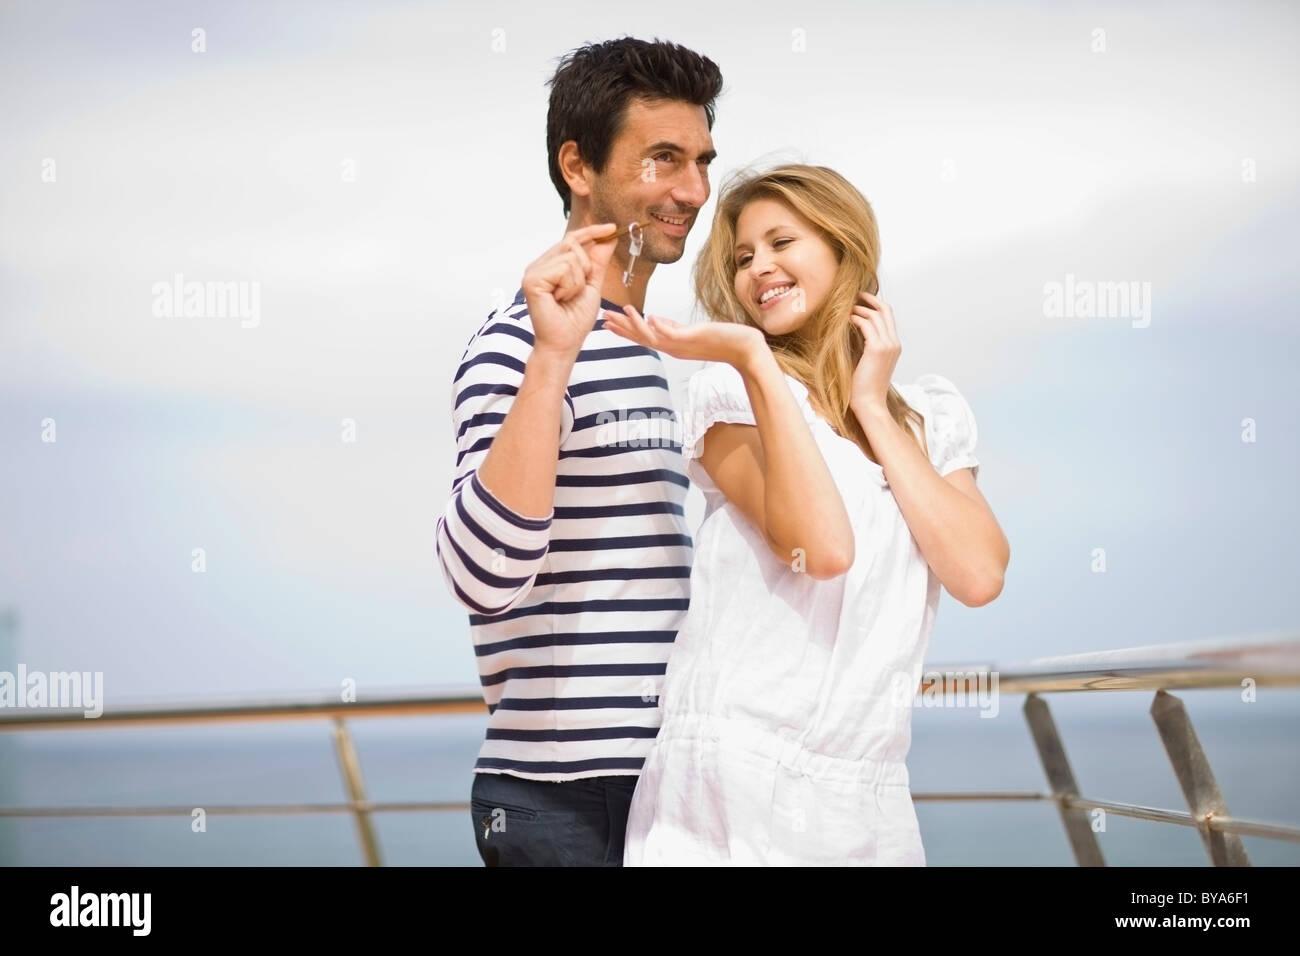 Couple on yacht - Stock Image